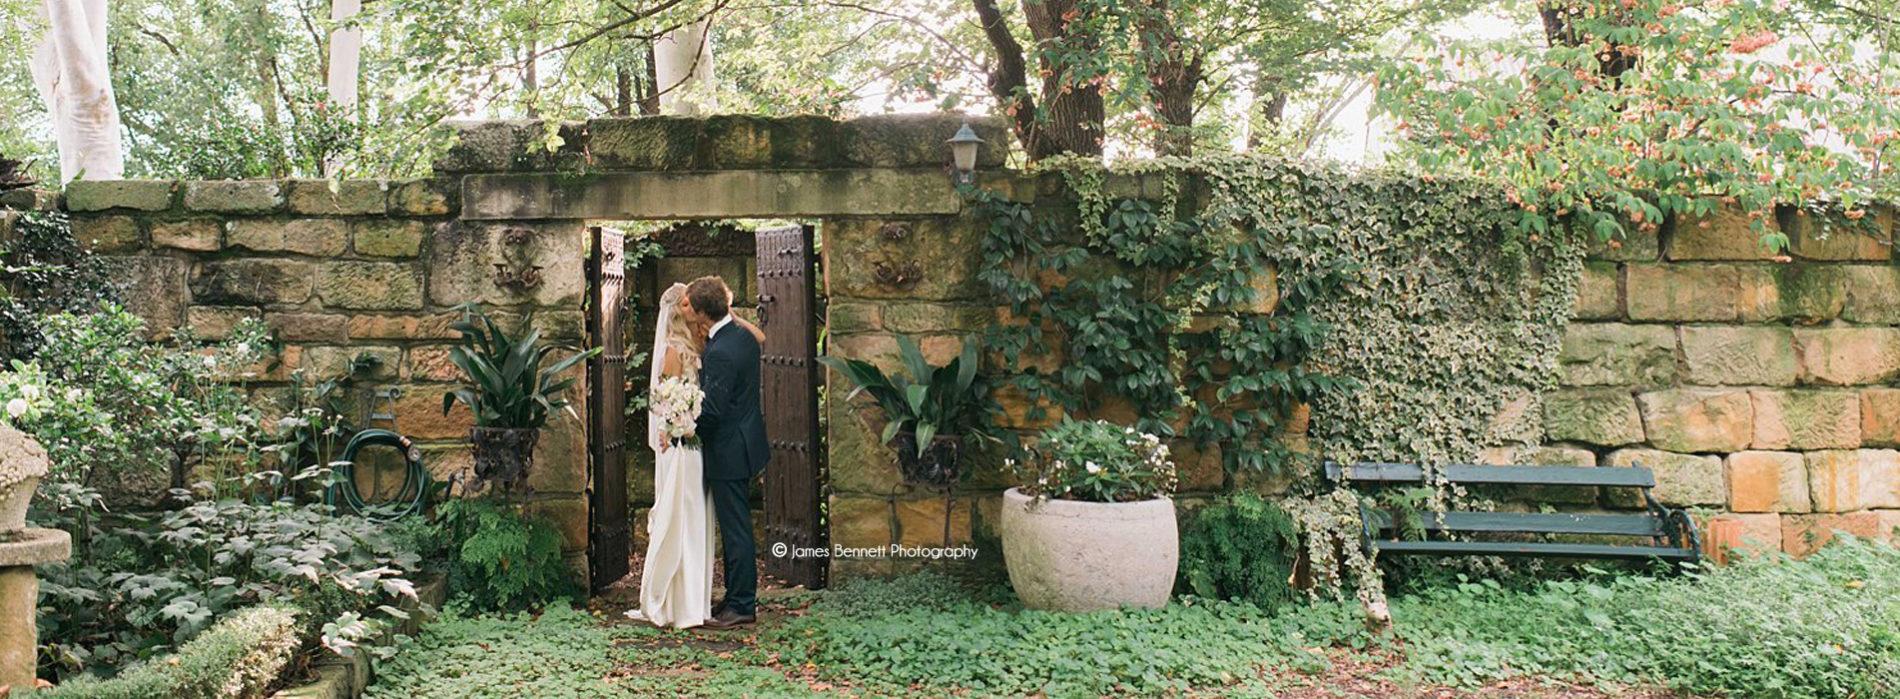 3historic-garden-wedding-newcastle